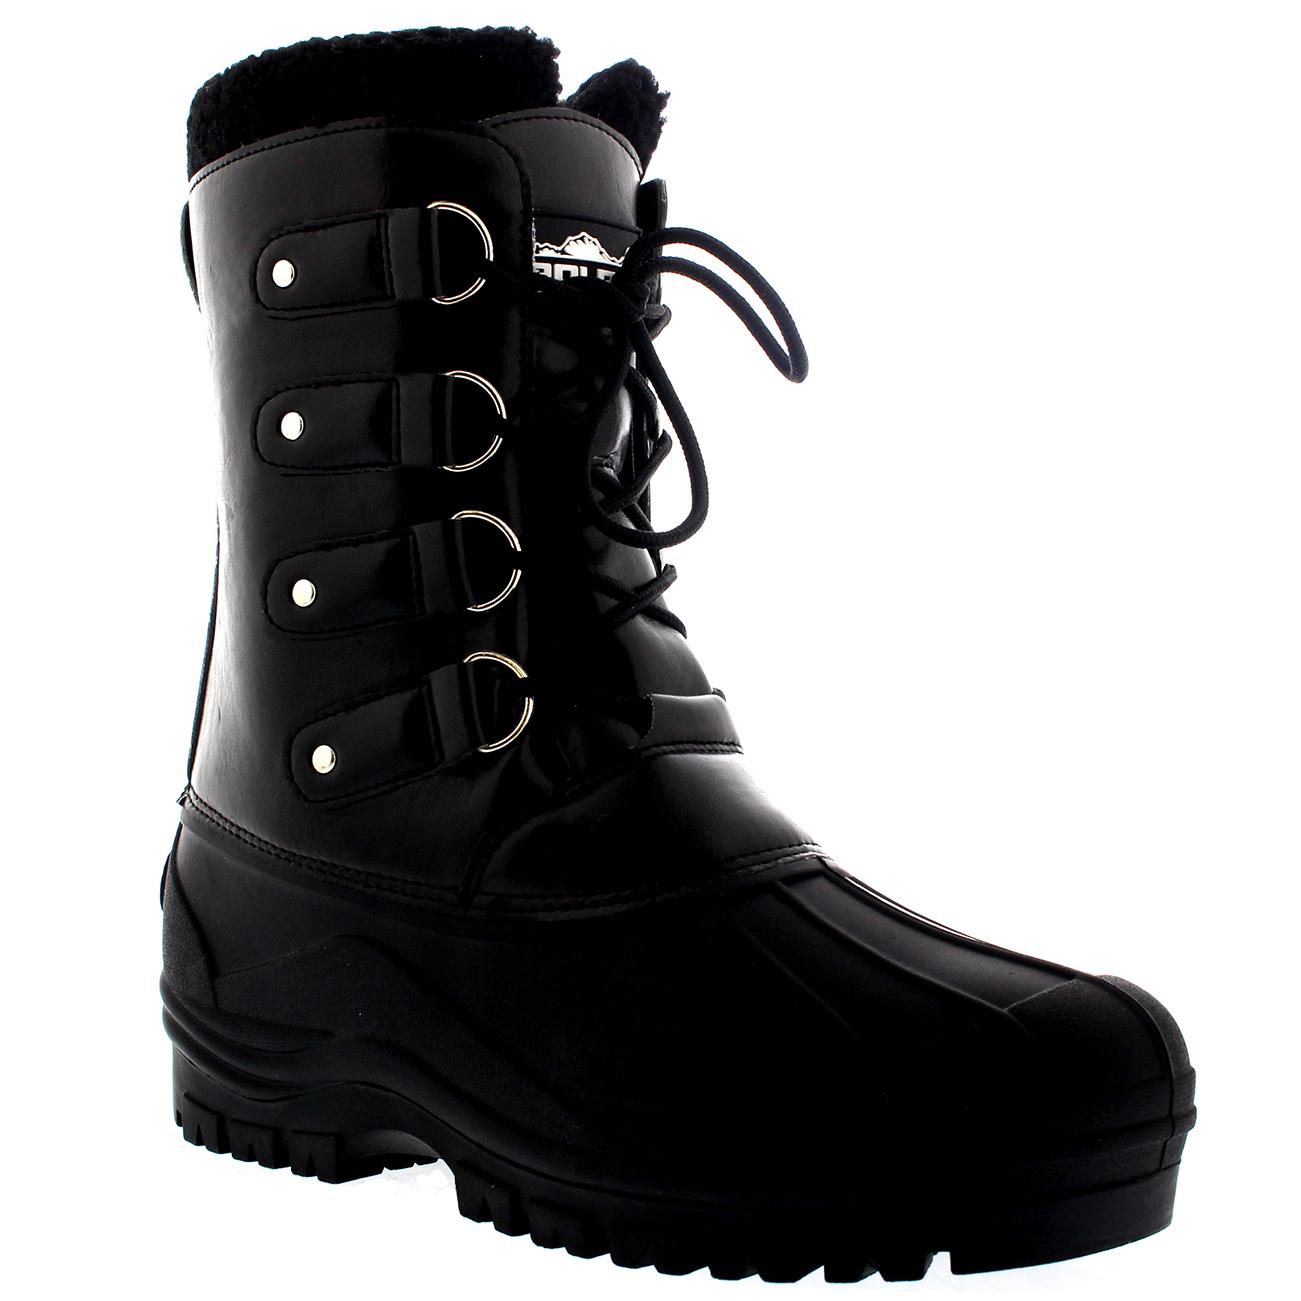 ad7043b903d73c Mens Outdoor Waterproof Hiking Faux Fur Duck Mountain Dog Walking Boots US  7-15